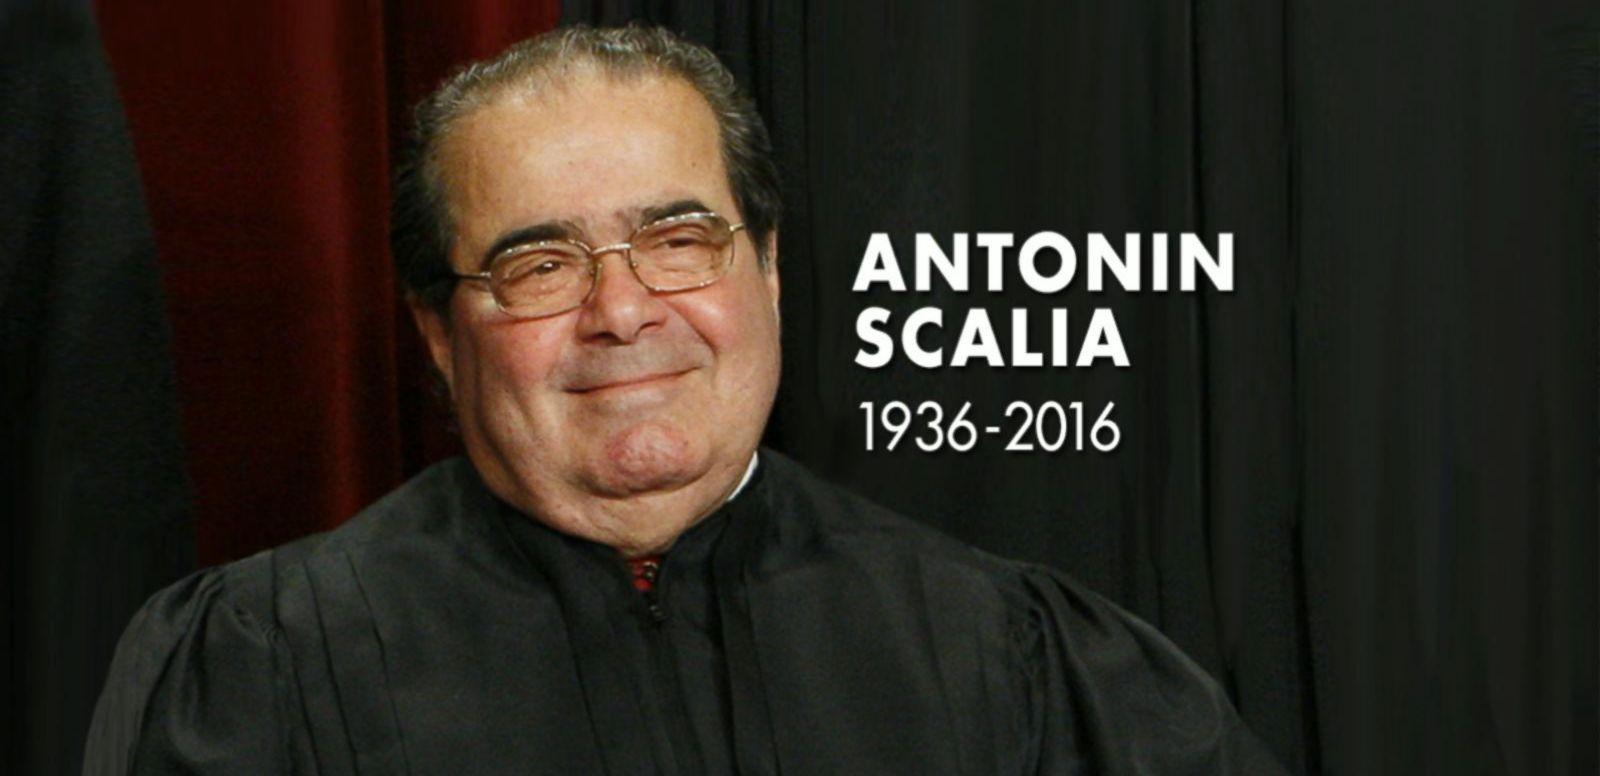 VIDEO: Supreme Court Justice Antonin Scalia Dies at Age 79